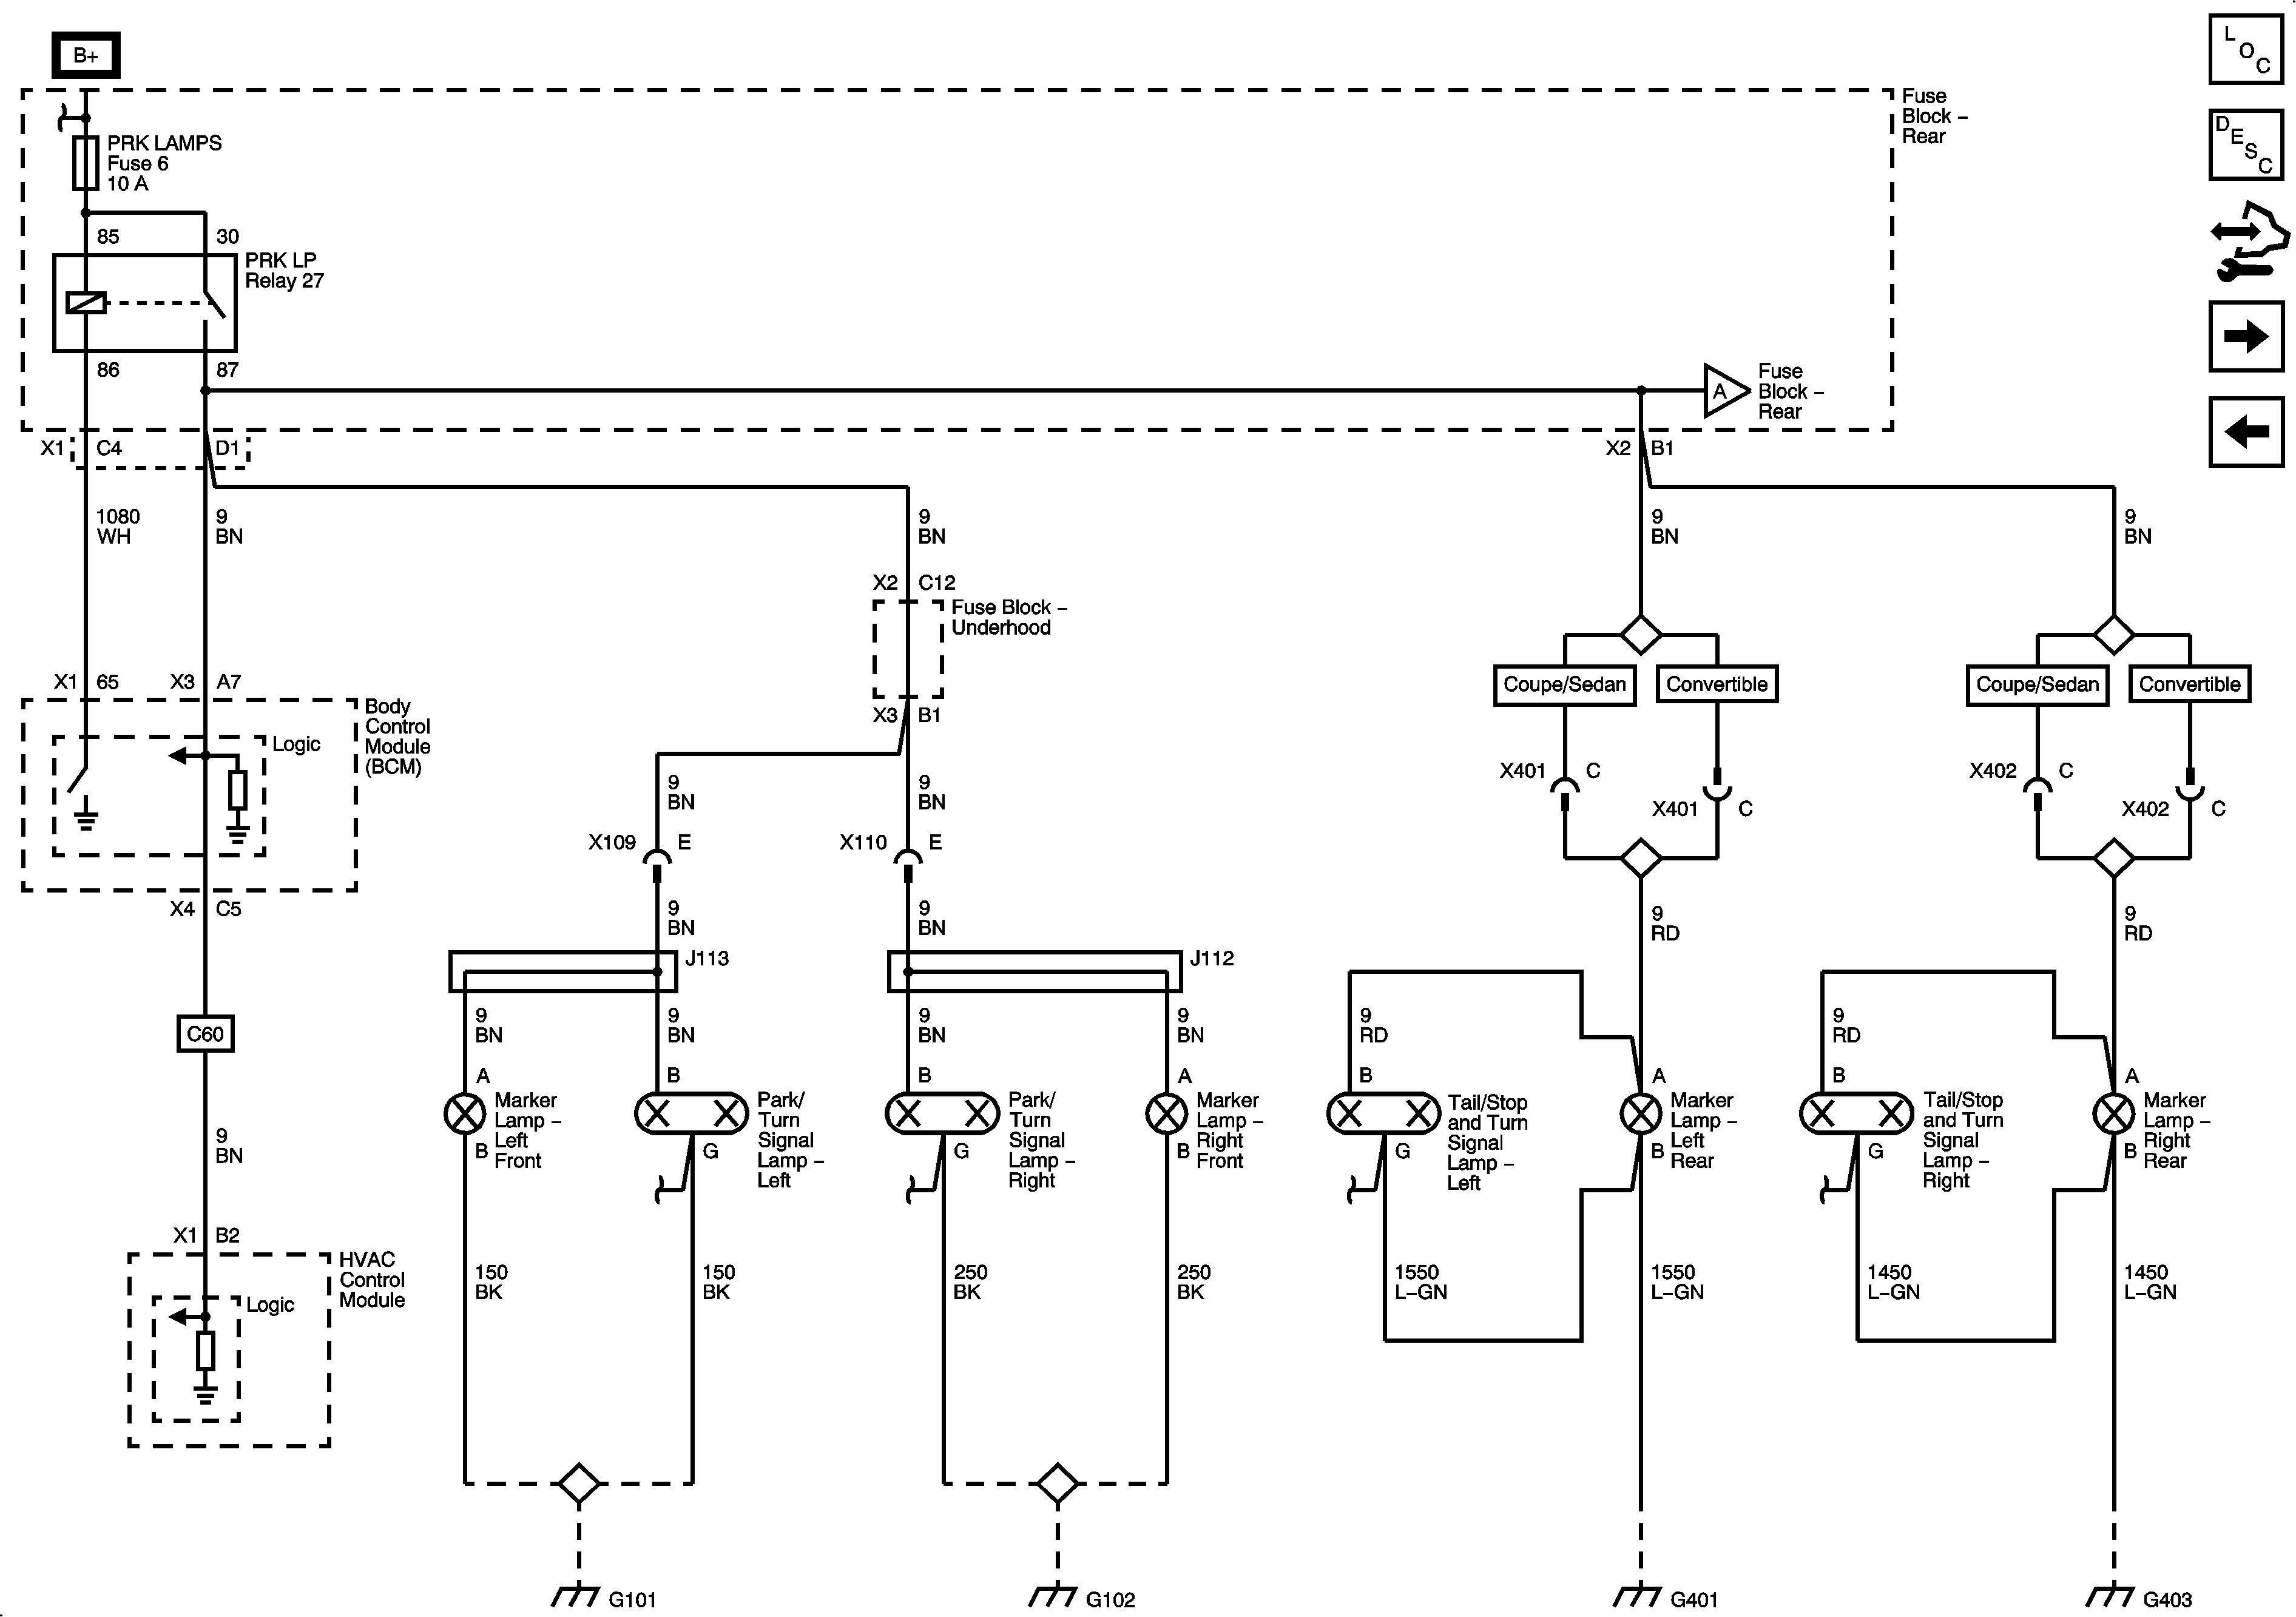 2003 pontiac abs wiring diagram 09 g6 wiring diagram wiring diagram data  09 g6 wiring diagram wiring diagram data